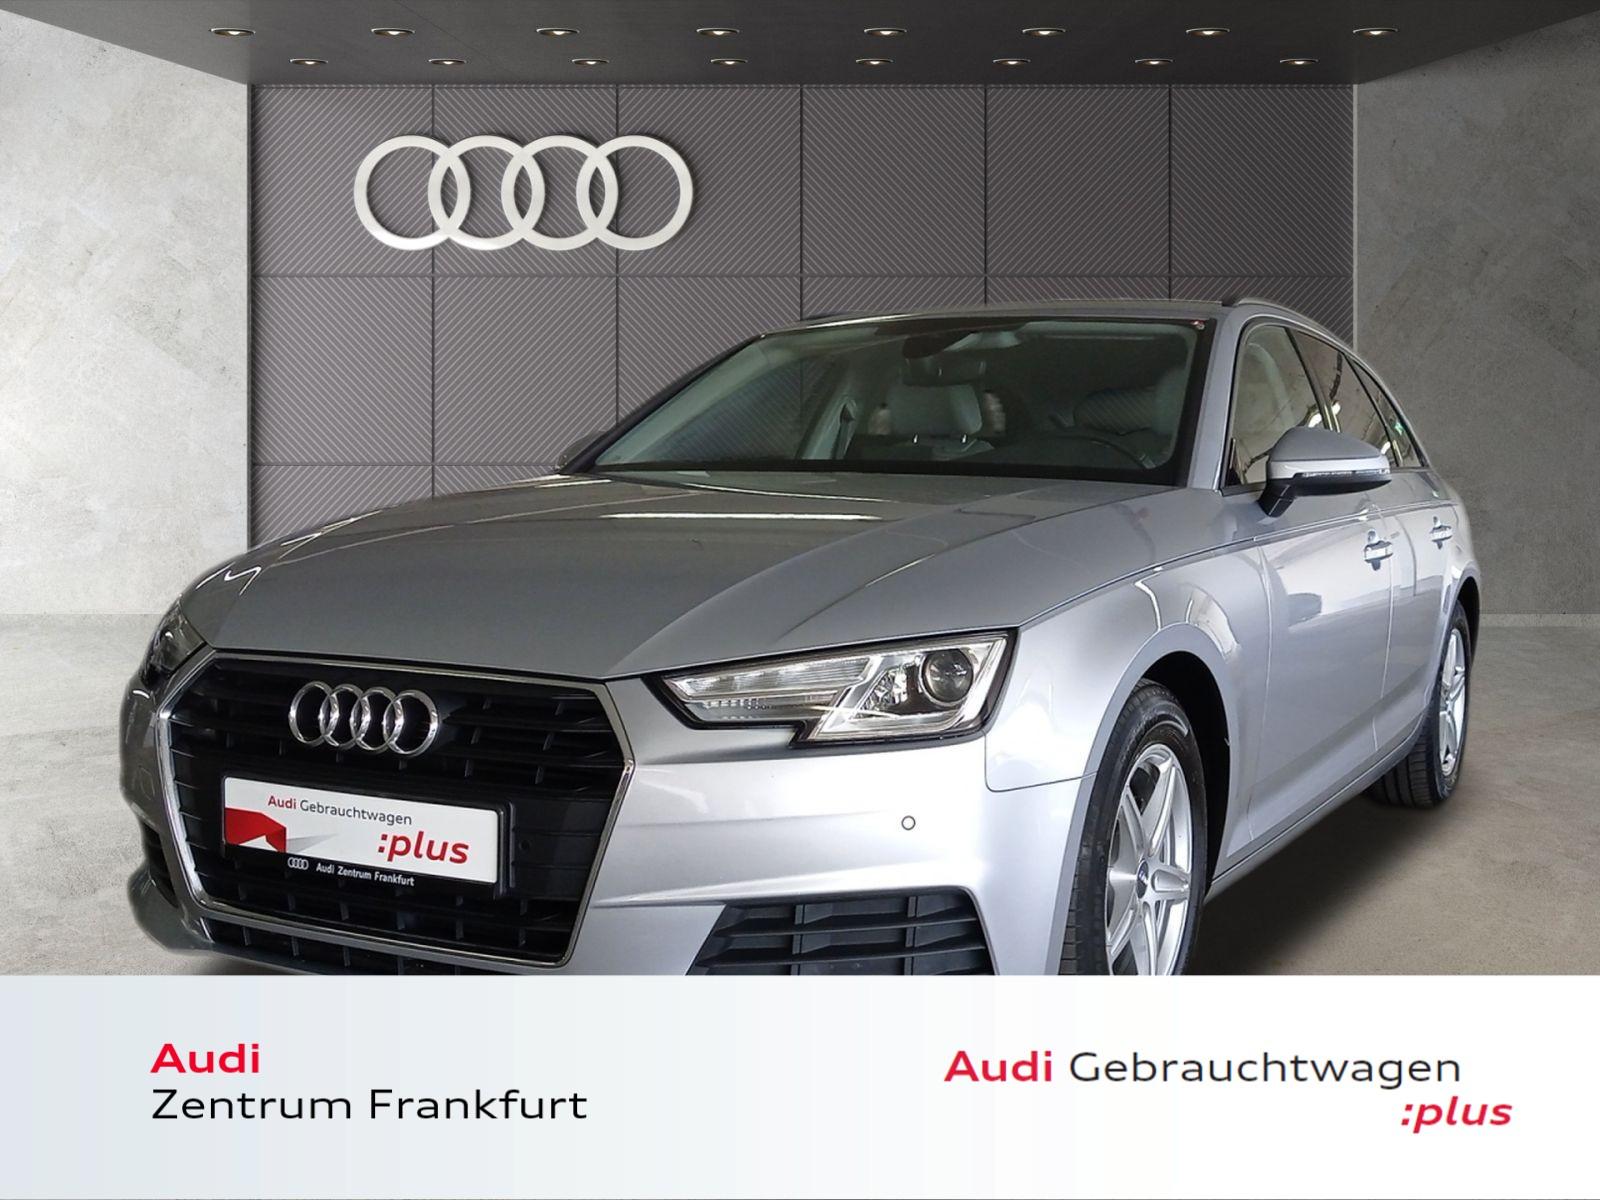 Audi A4 Avant 2.0 TDI ultra Xenon Navi PDC Tempomat, Jahr 2018, Diesel